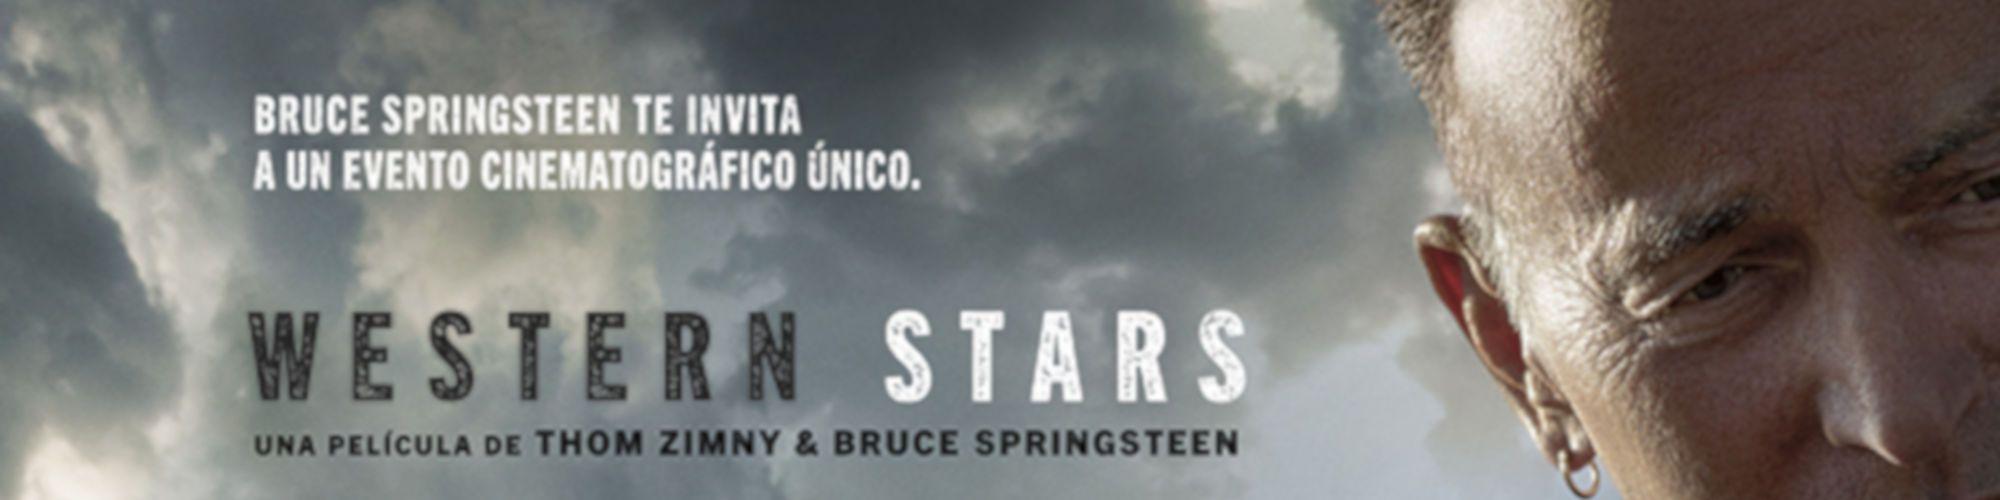 BRUCE SPRINGSTEEN Western Stars (Banner SuperiorOK)